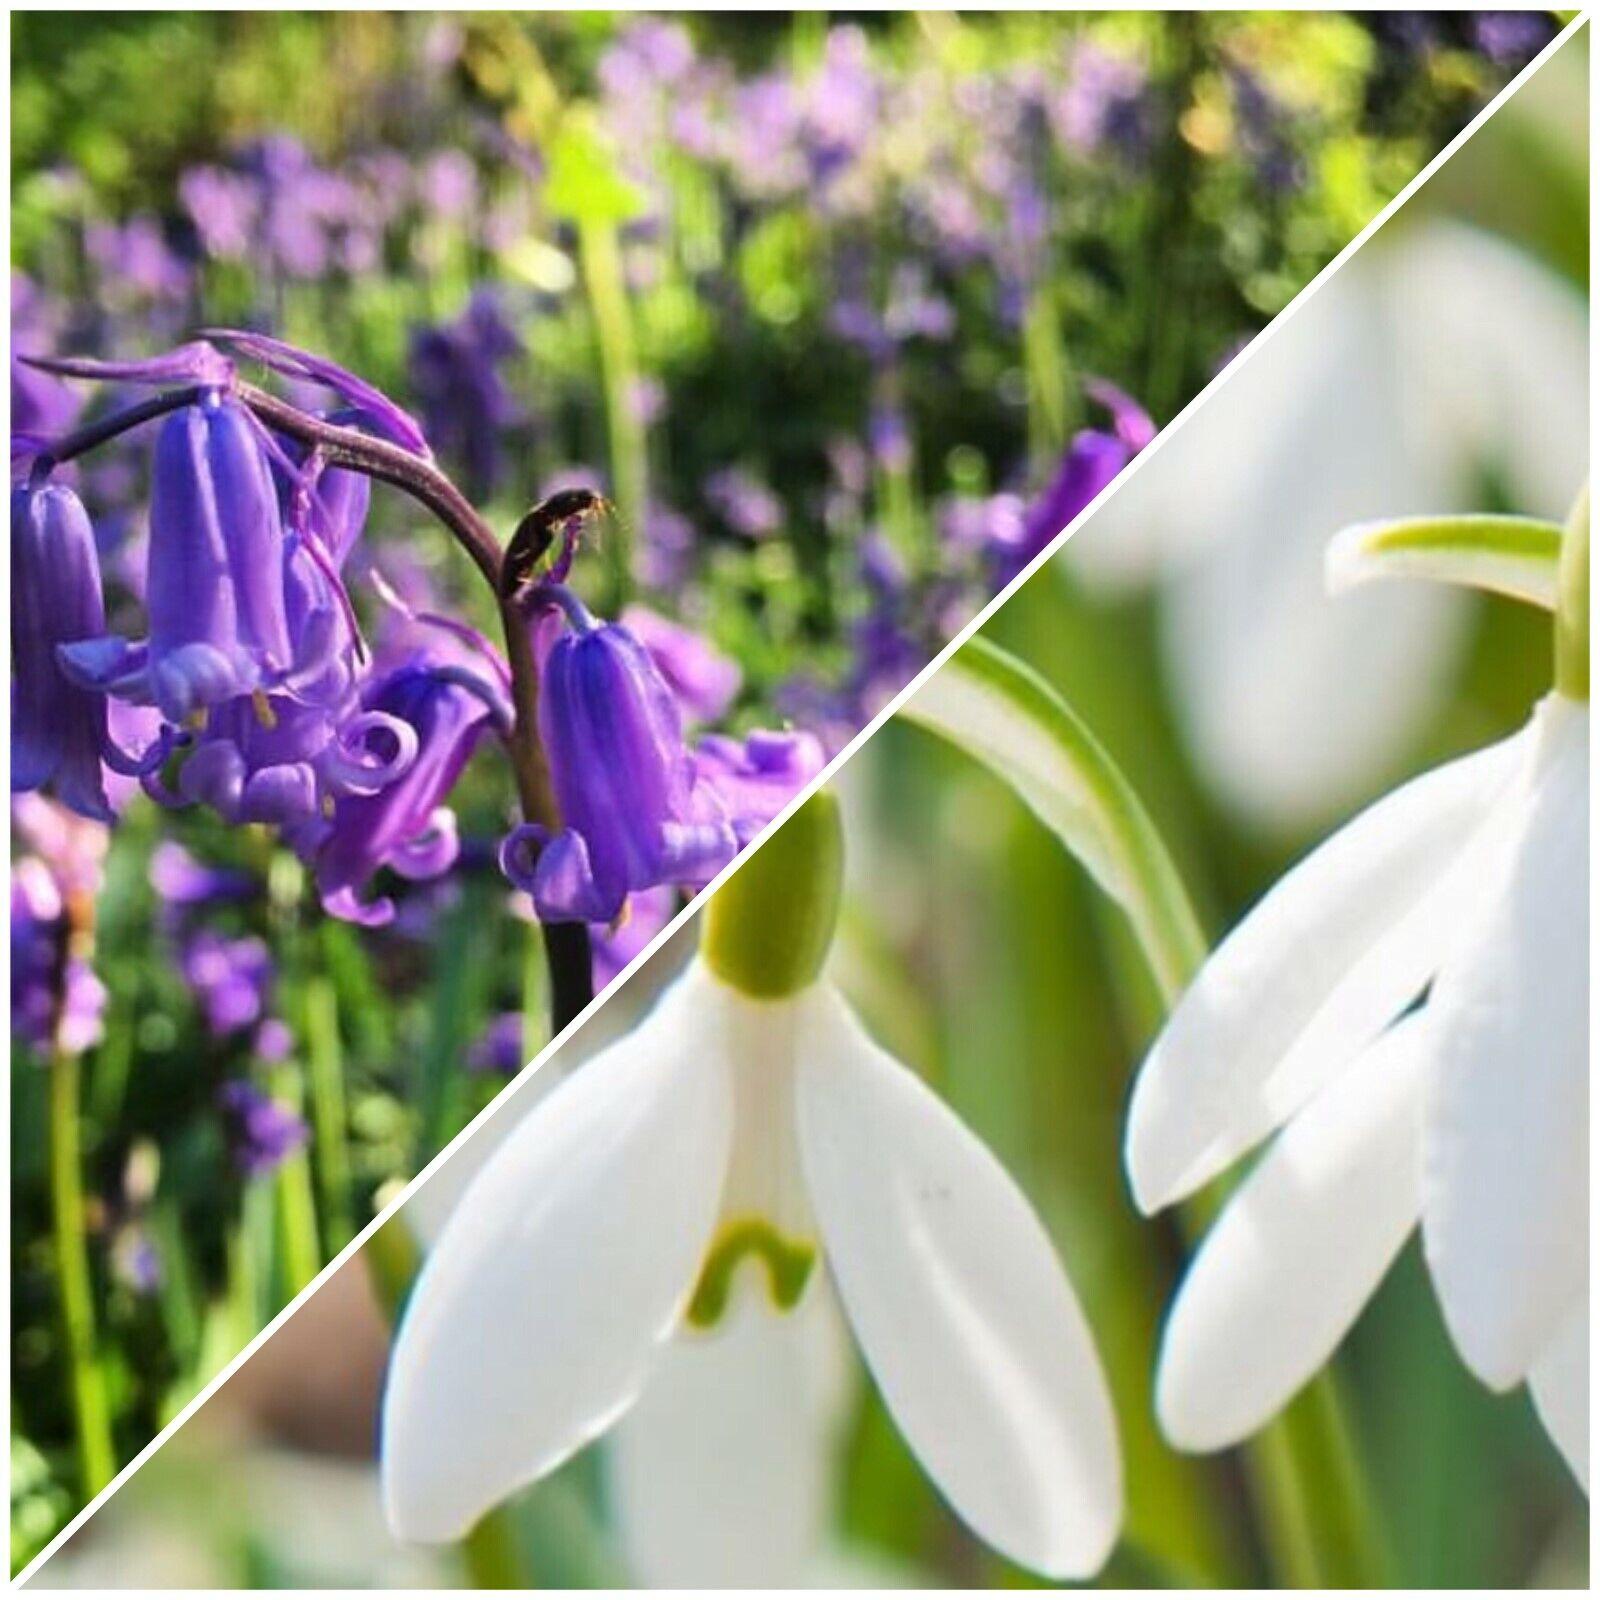 10 SINGLE SNOWDROP BULBS & 10 BLUEBELL BULBS Premium Quality Flowering Bulbs